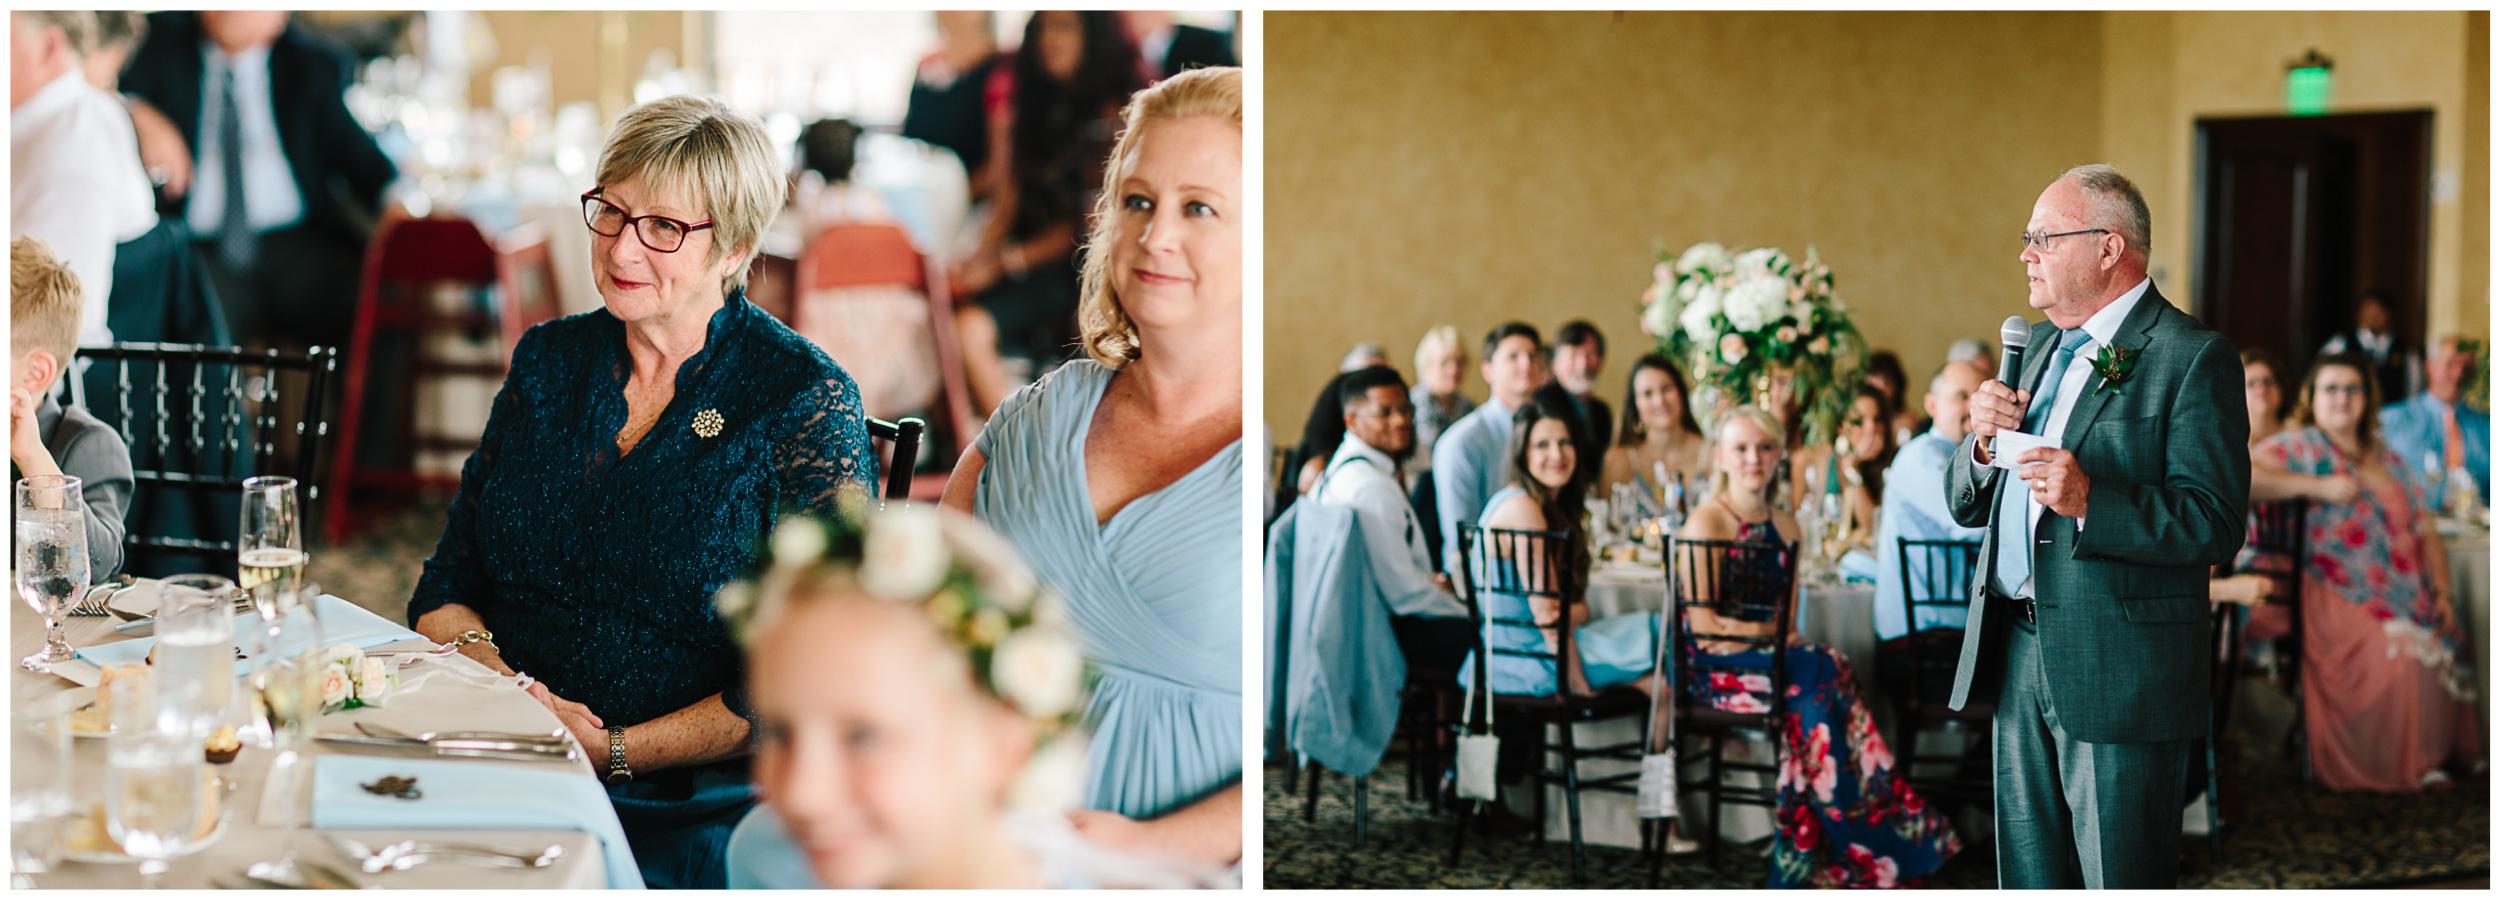 bella_collina_wedding_85.jpg